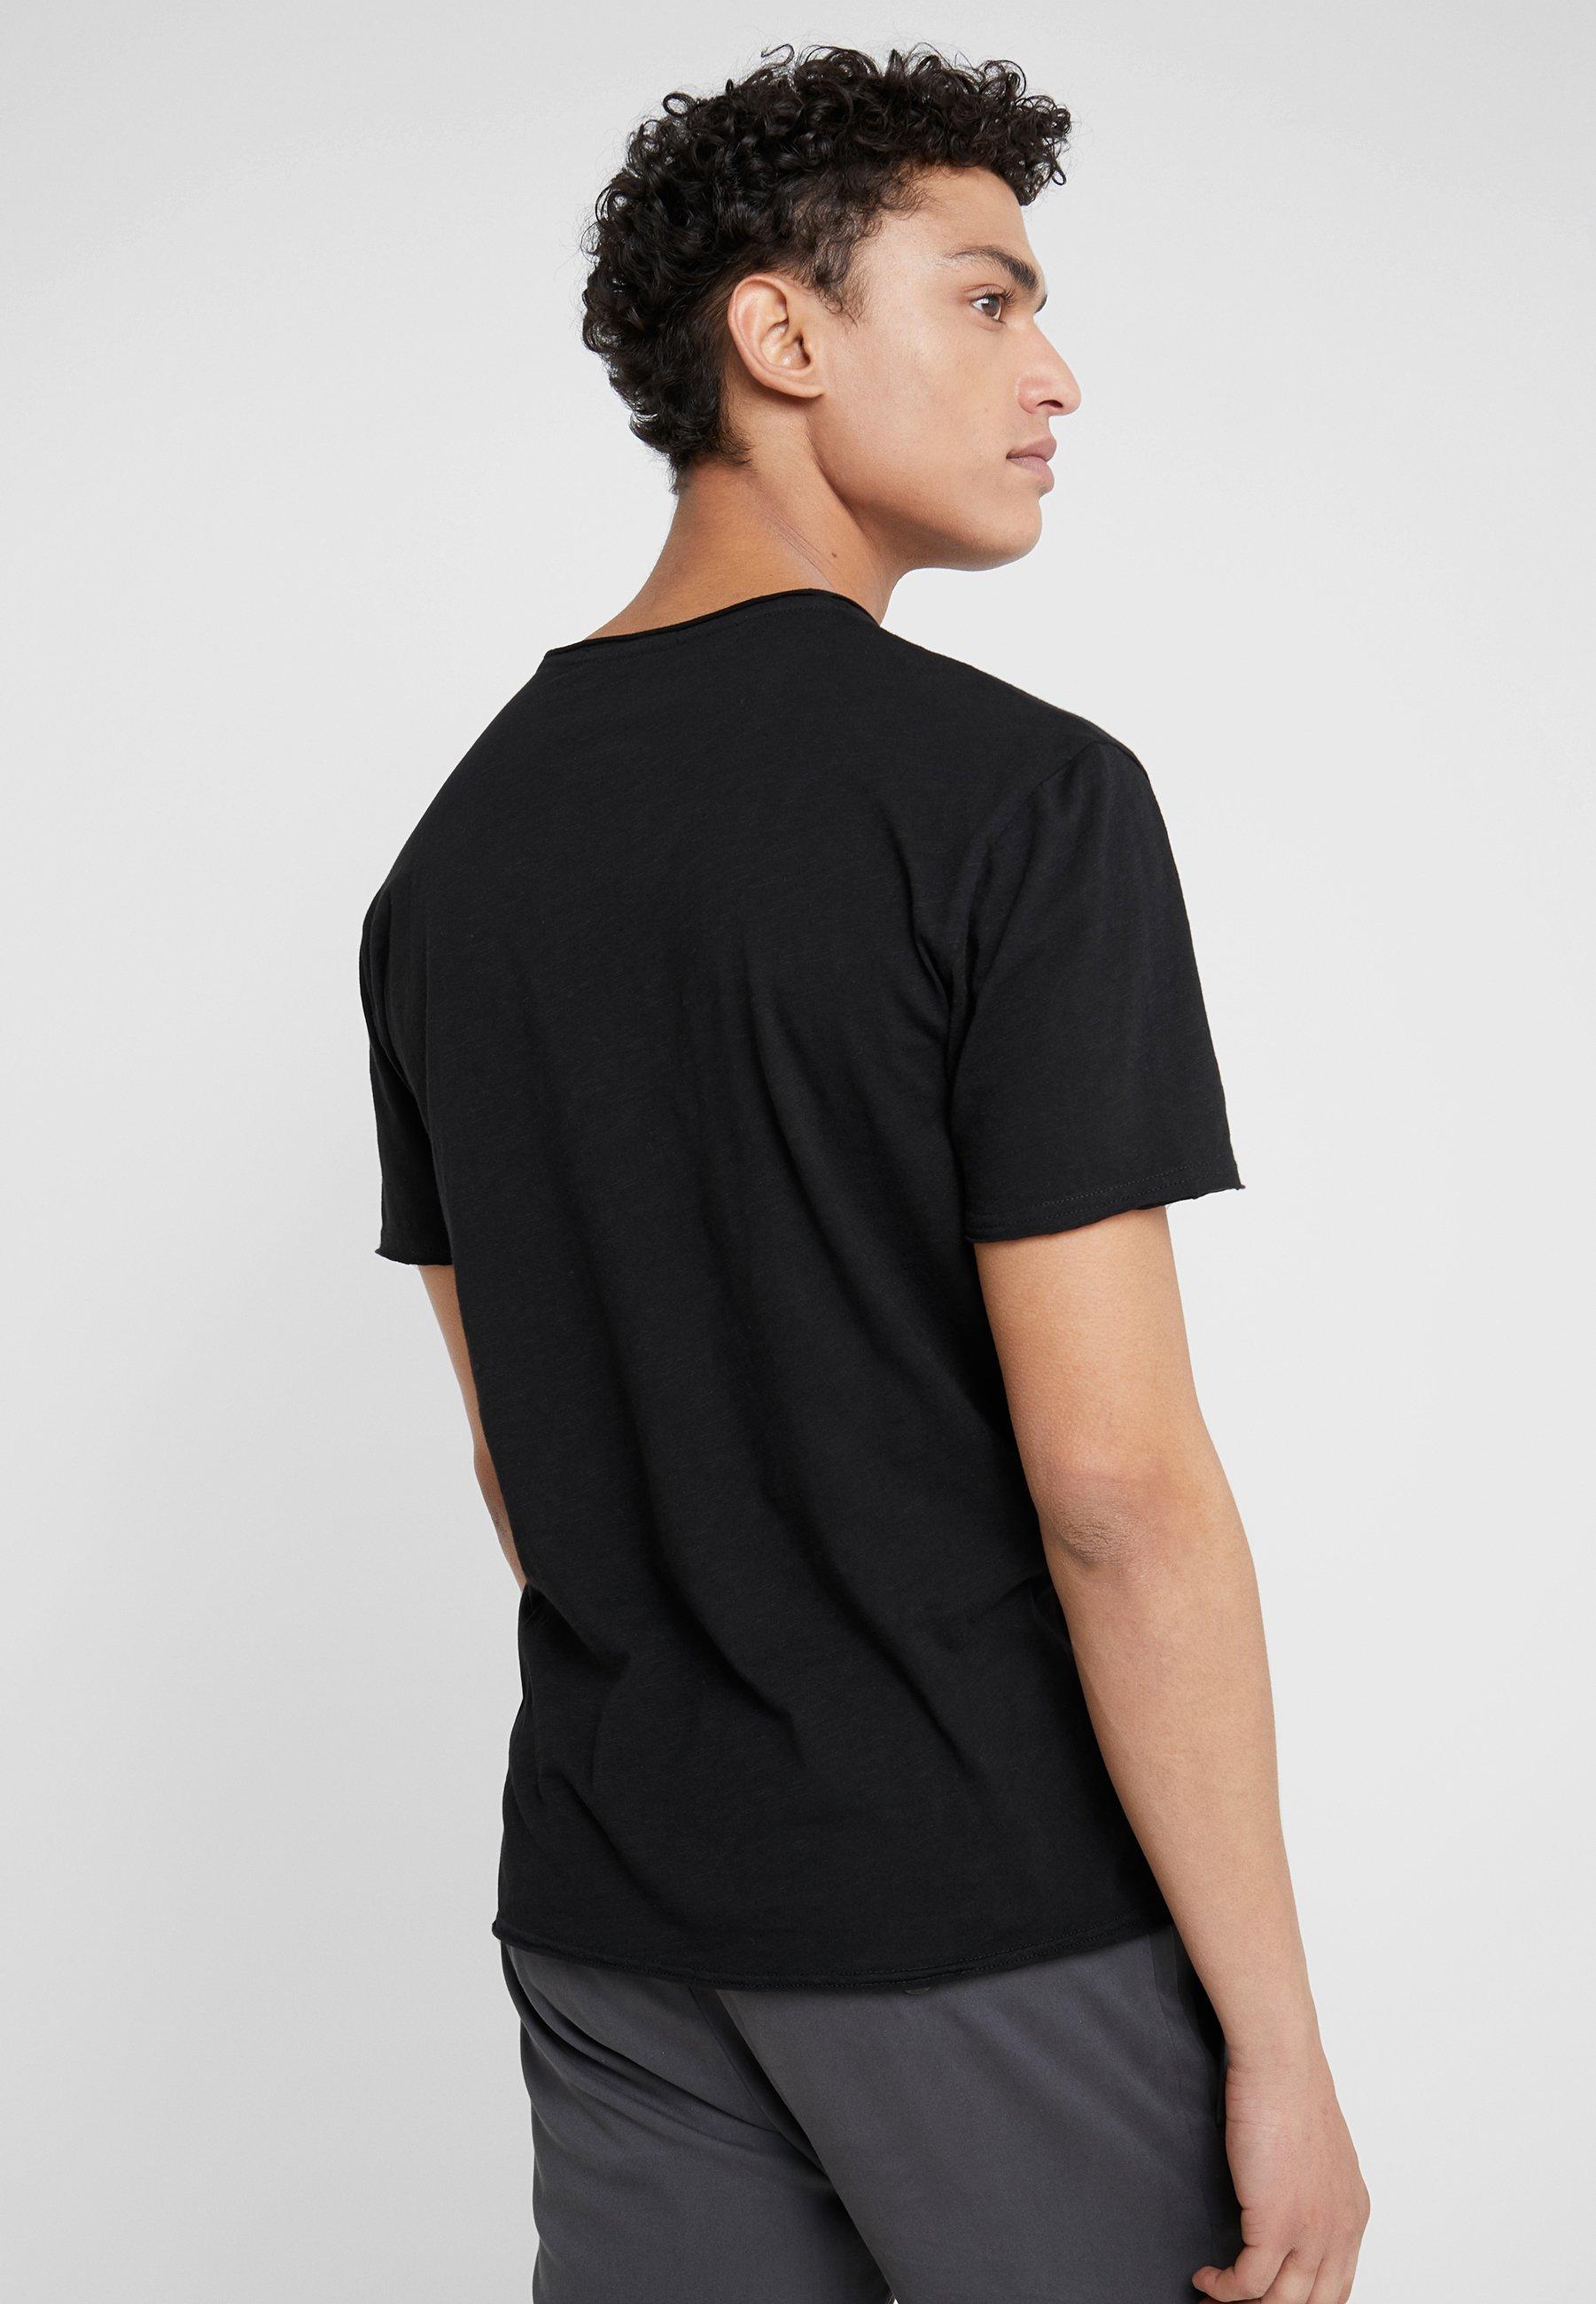 shirt Drykorn shirt Drykorn TeoT TeoT Basic Schwarz 7bY6gyf